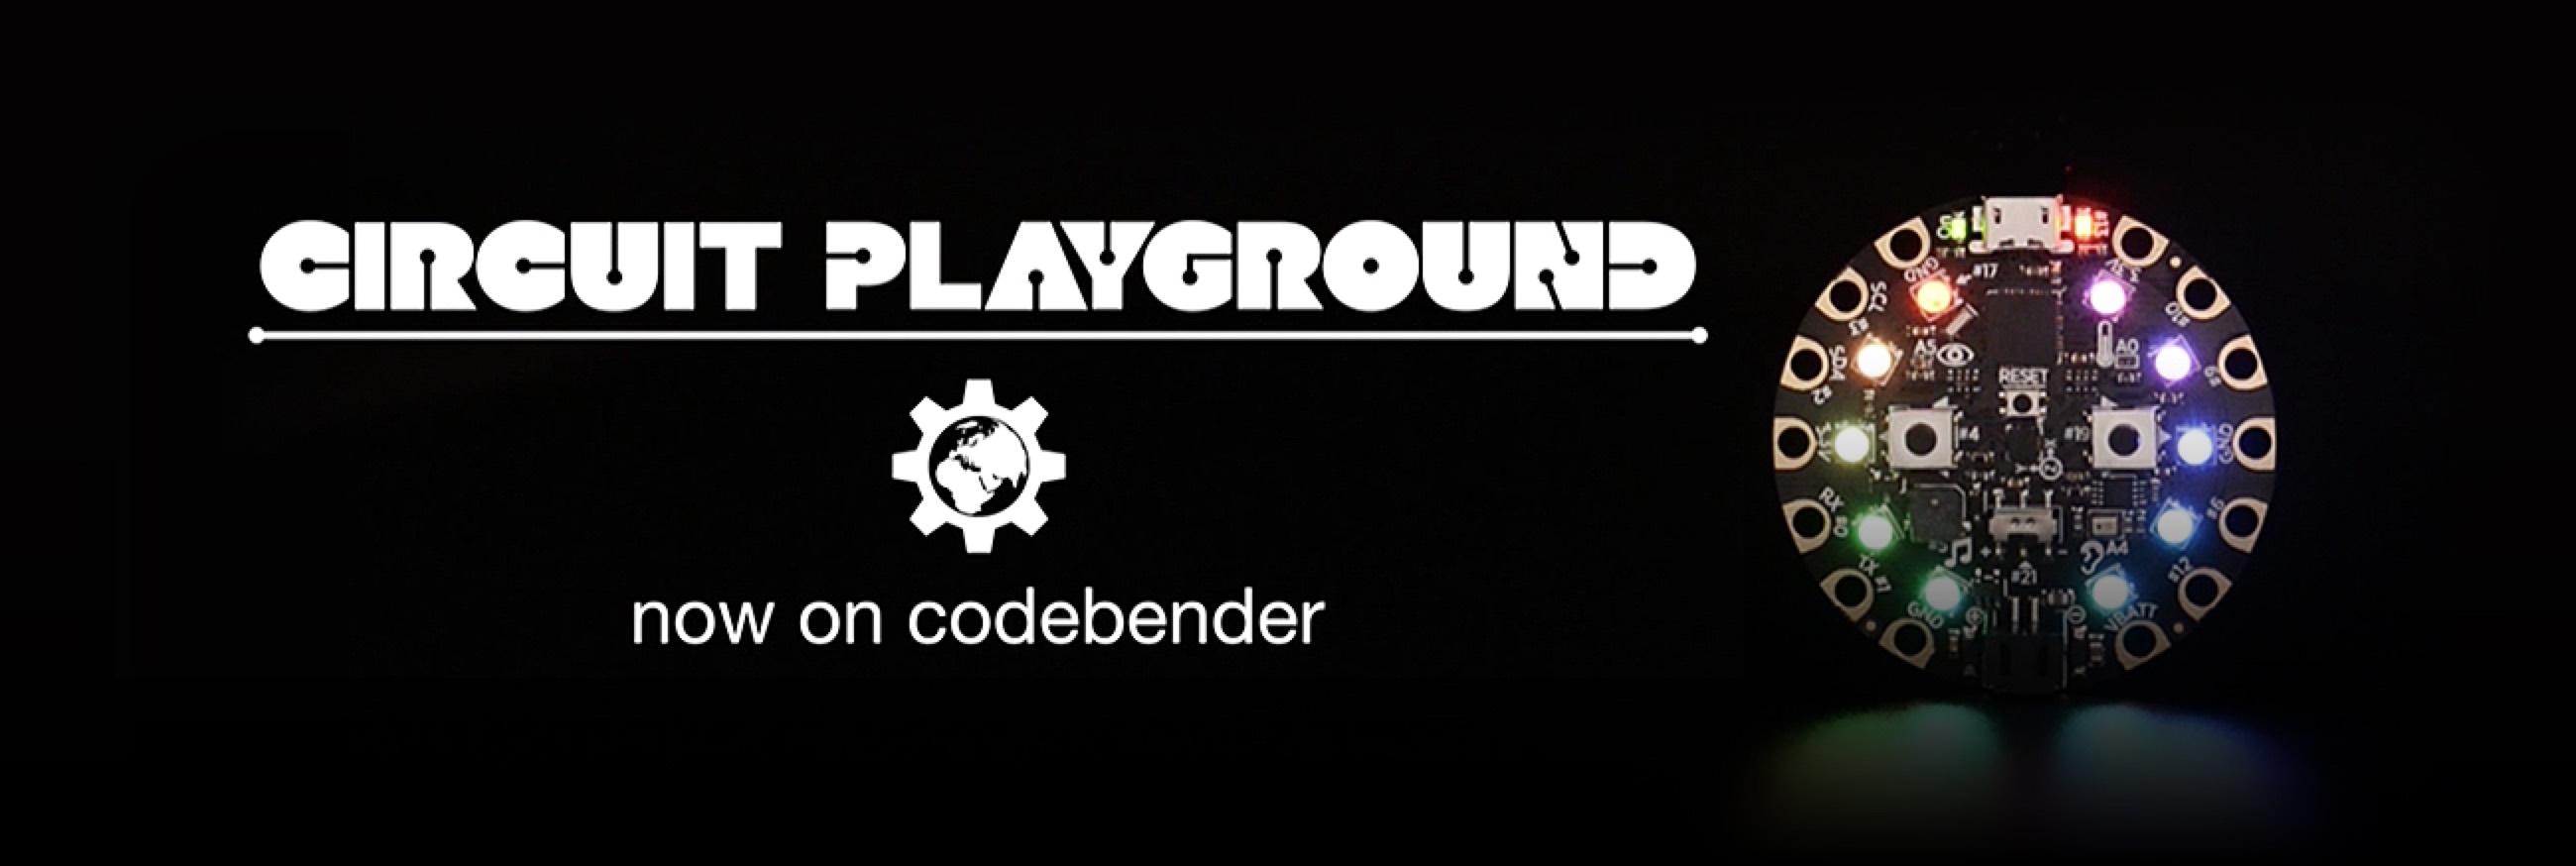 Adafruit Circuitplayground Codebender Blog